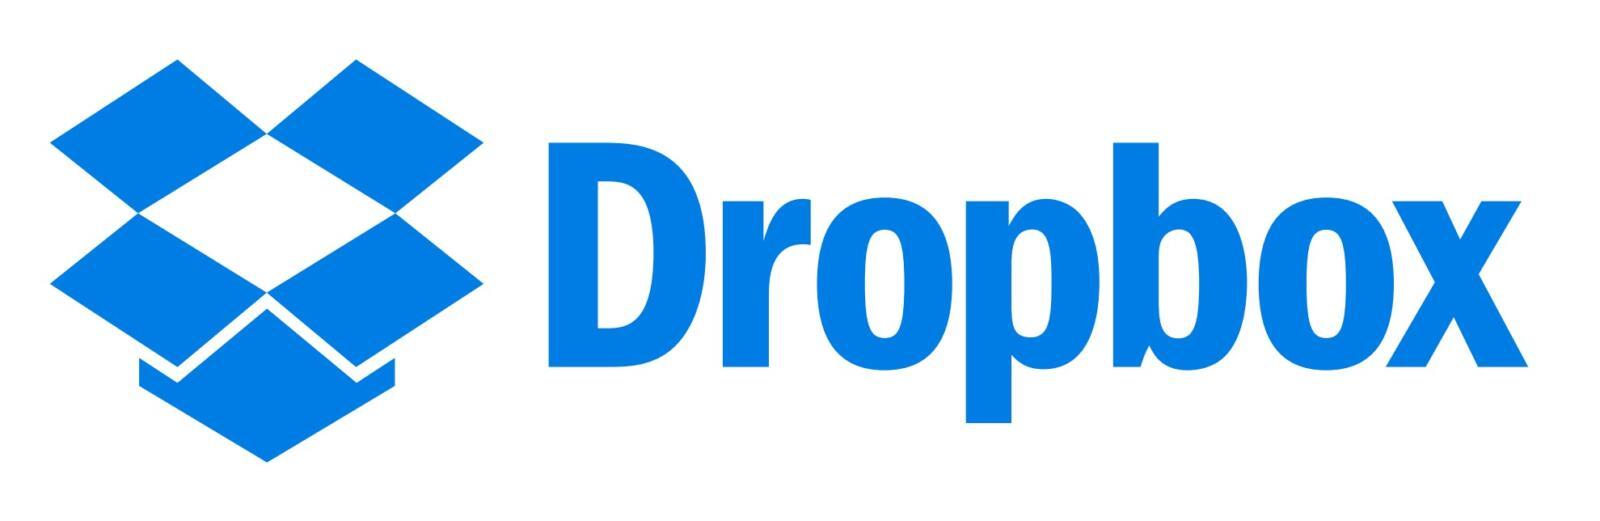 cloud dropbox